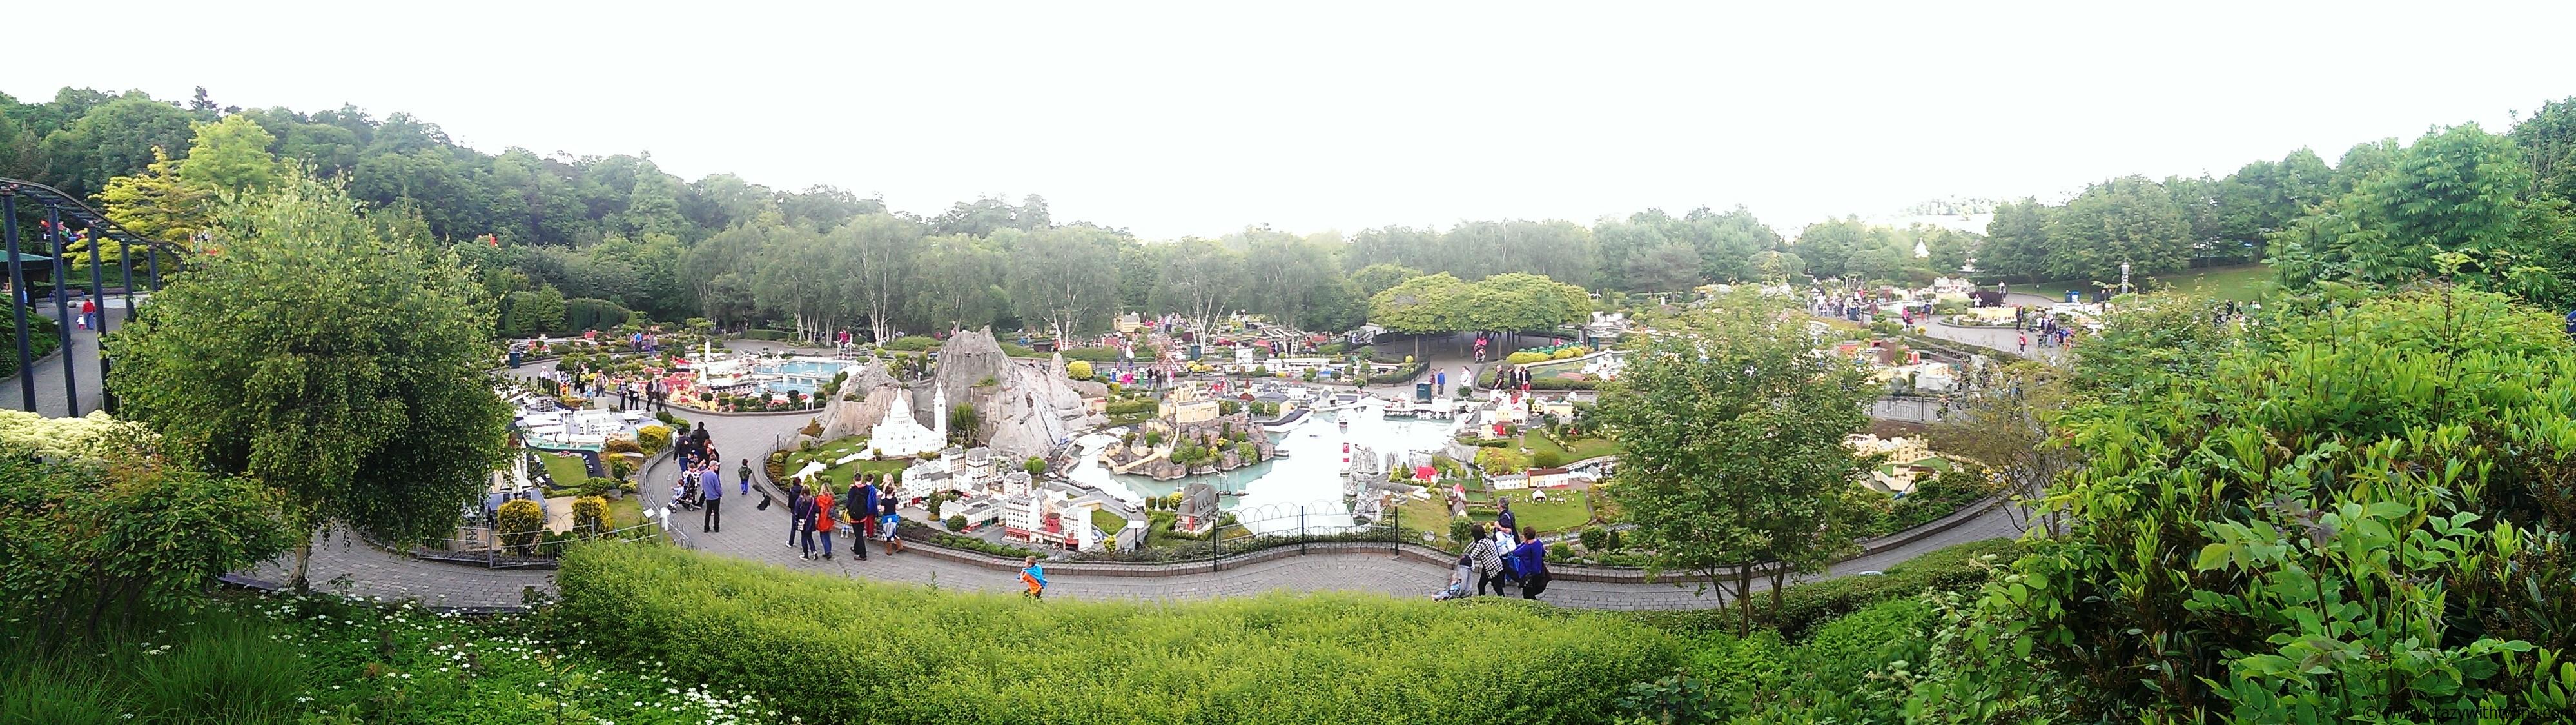 Legoland 2013 (53)